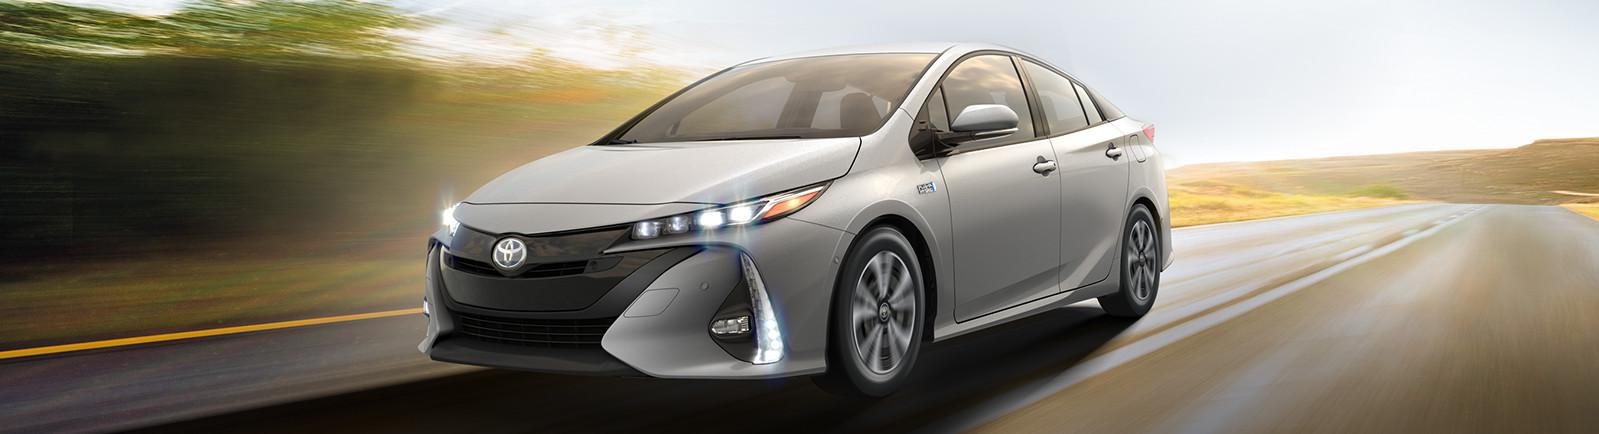 toyota-hybrid-hydrogen-fuel-cell-innovation-2016-prius-prime-m-narrow